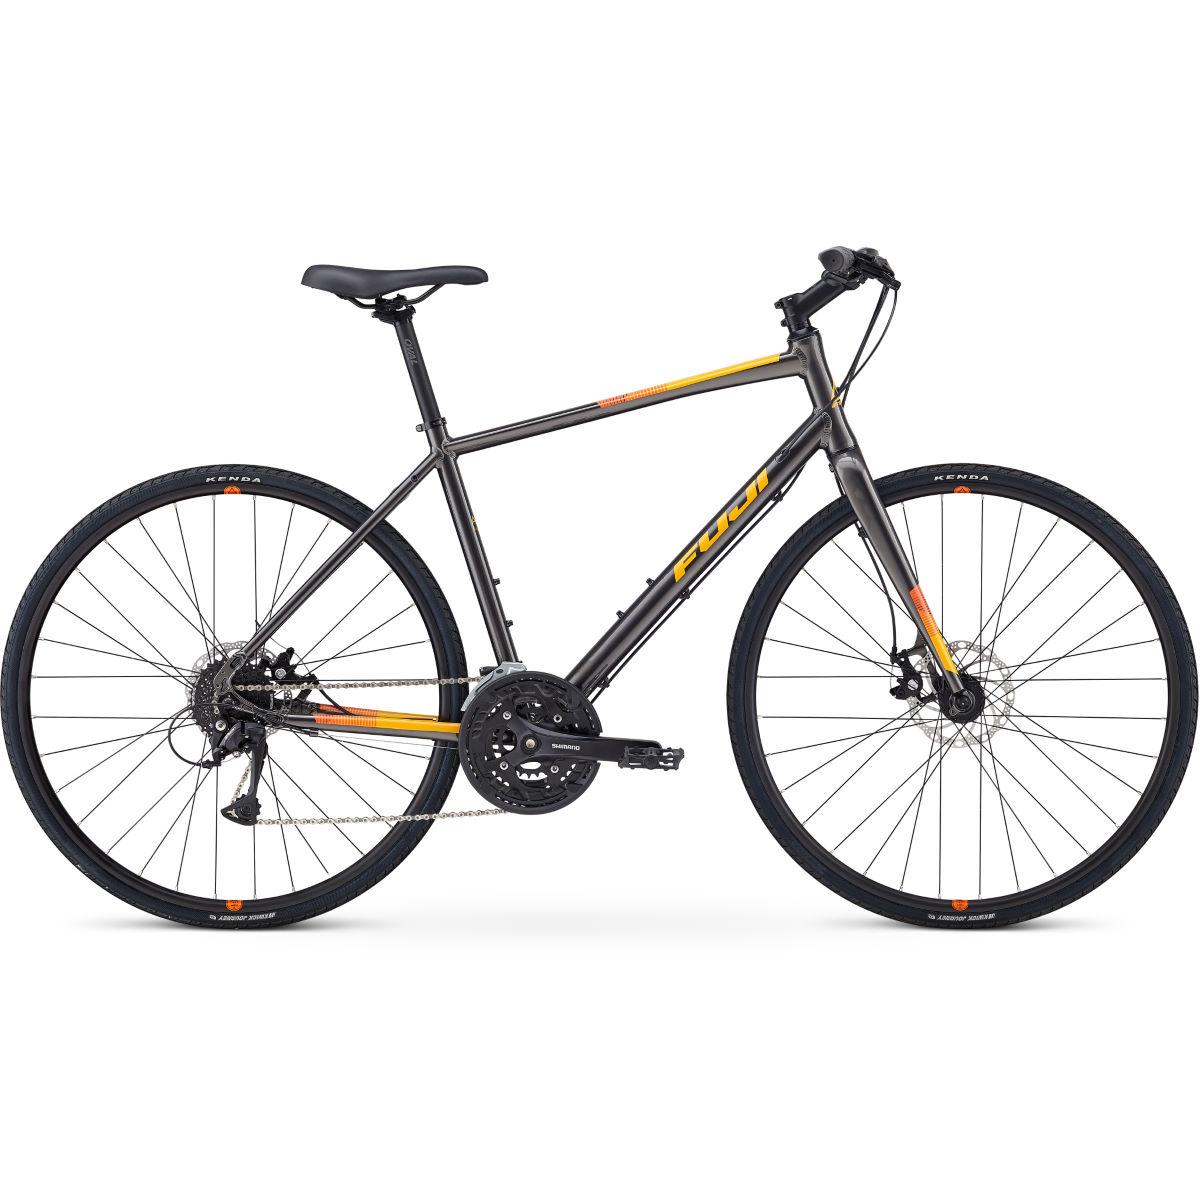 Fuji Absolute 1.7 2019 19 Graphite Bikes